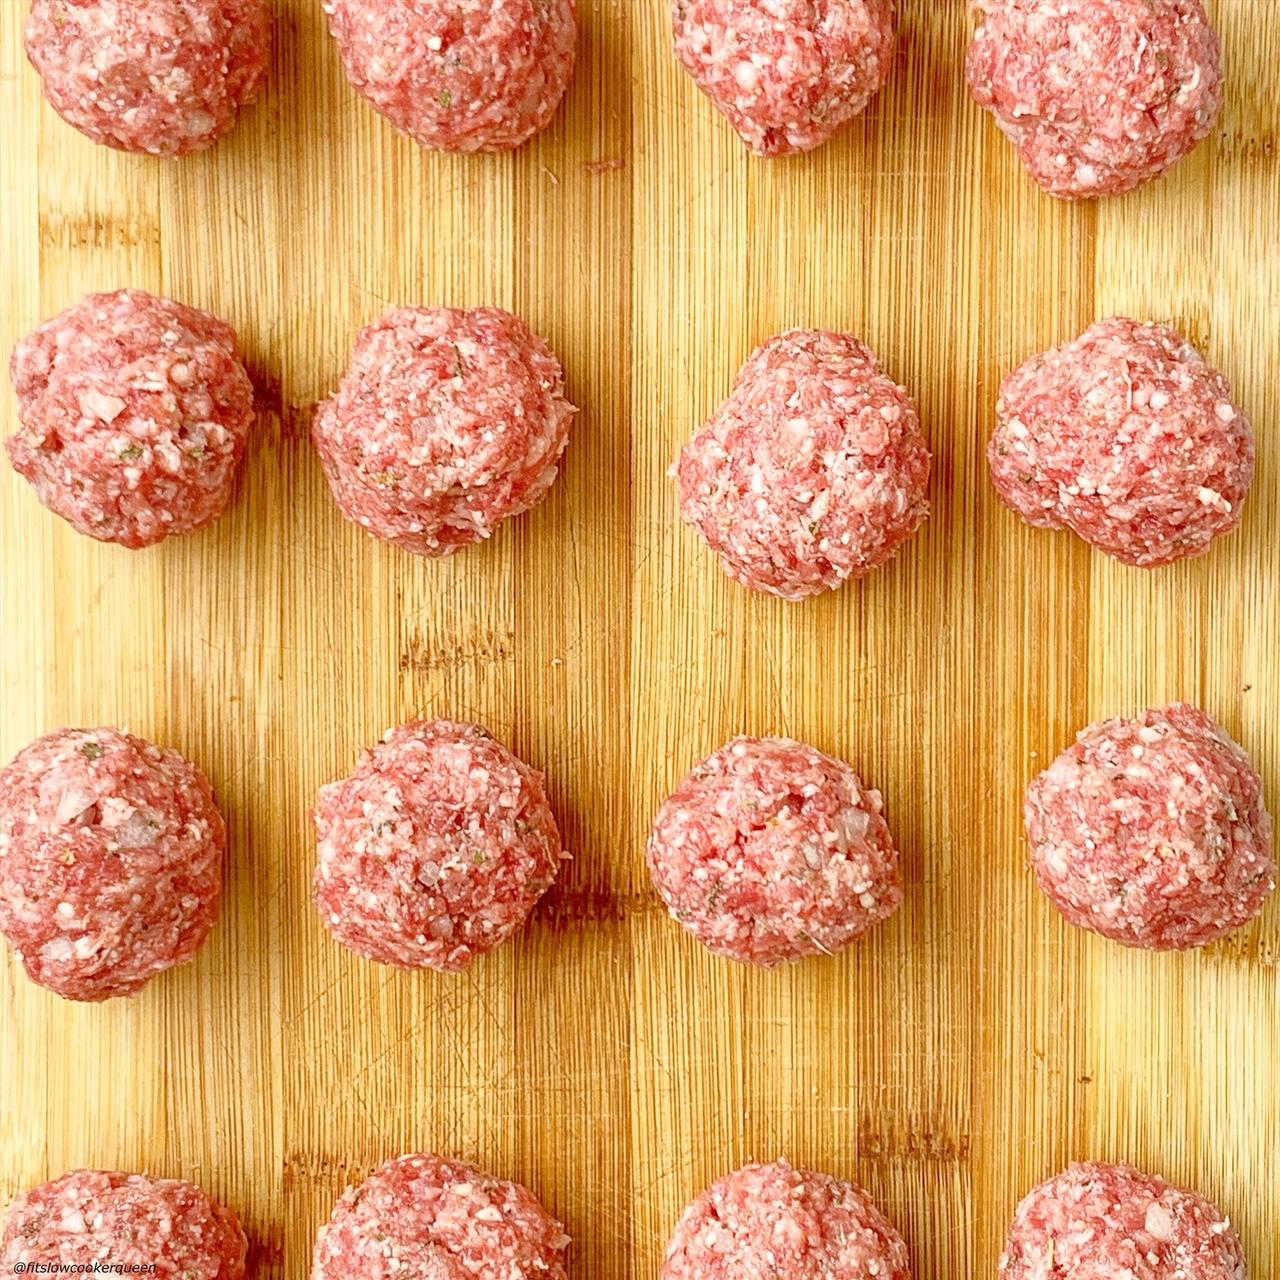 tray of meatballs for Italian wedding soup